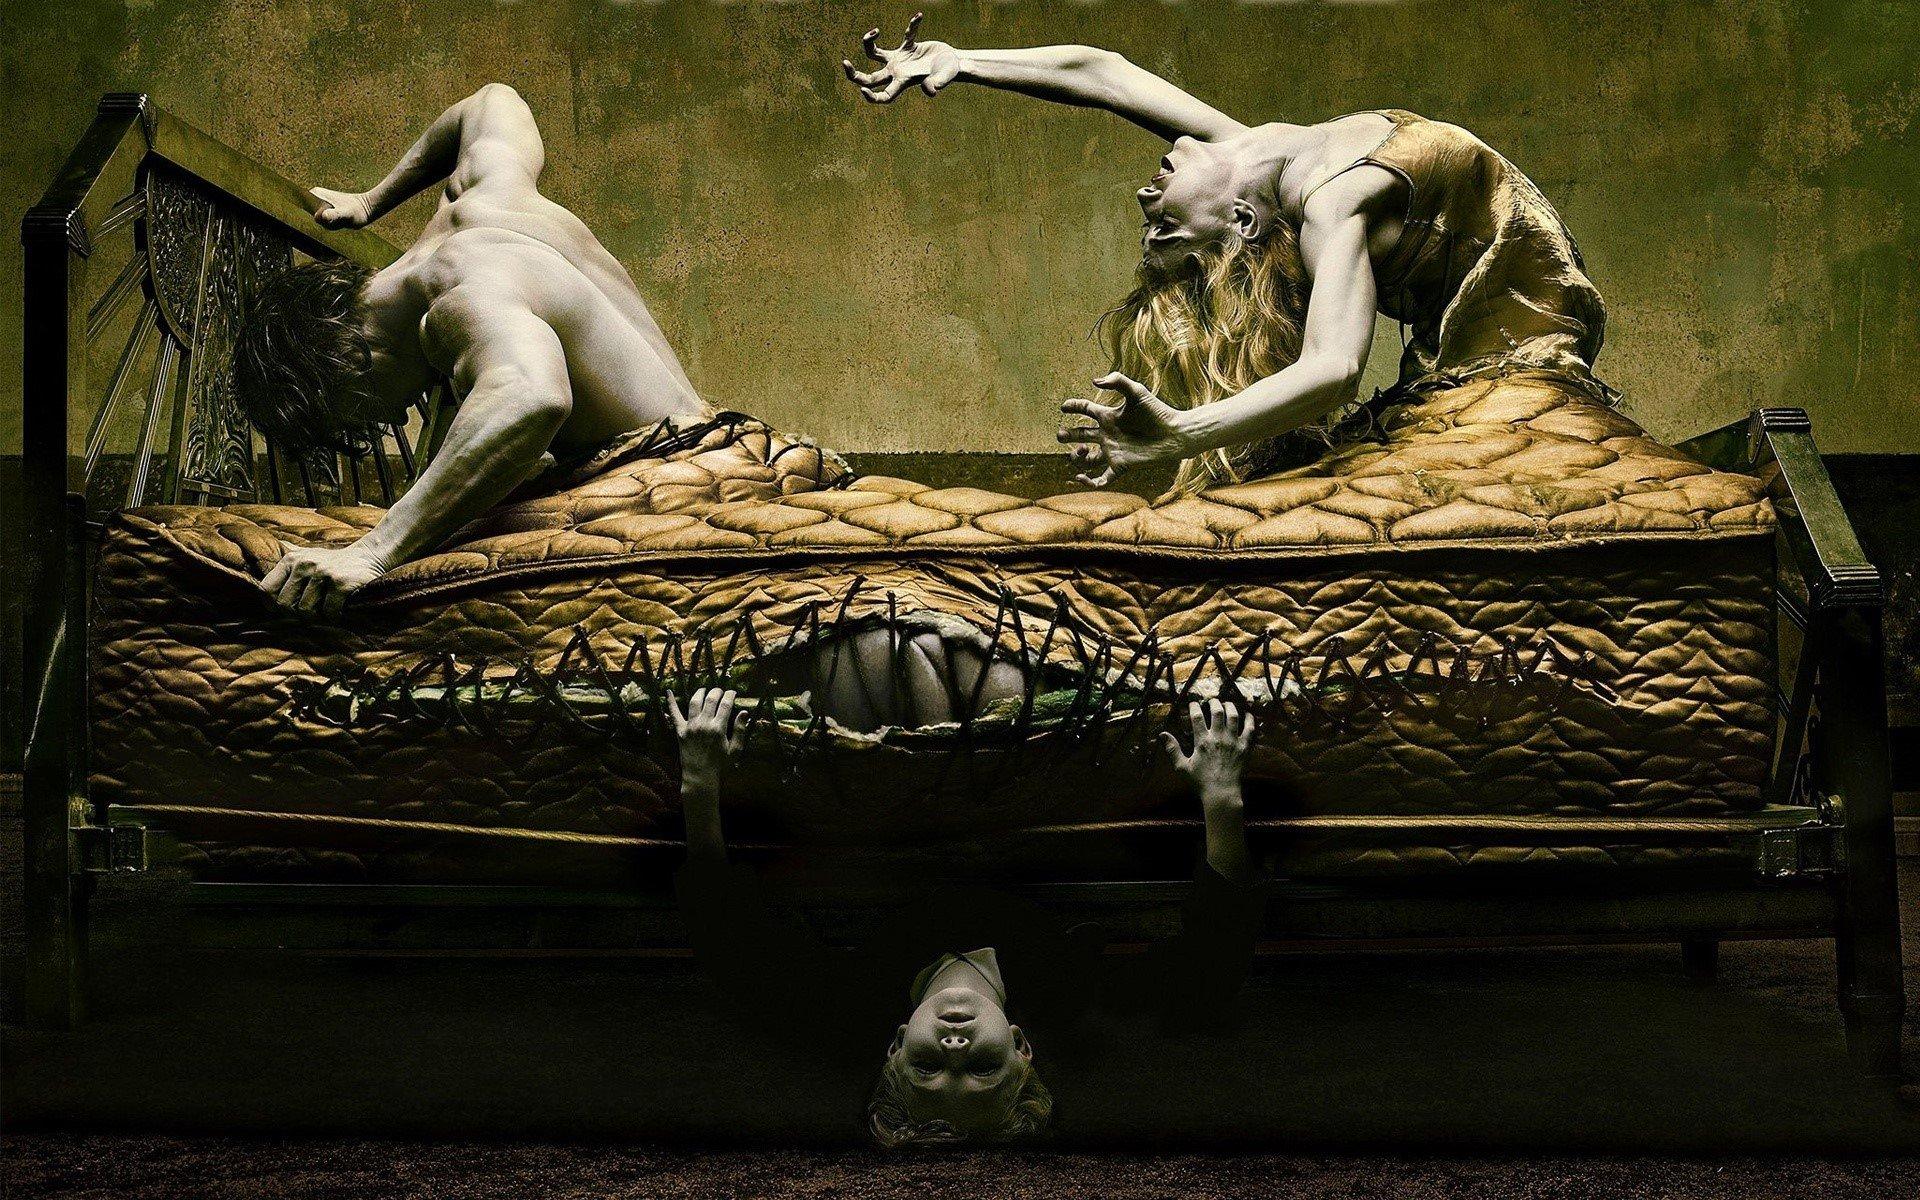 Wallpaper Season 5 of American Horror Story